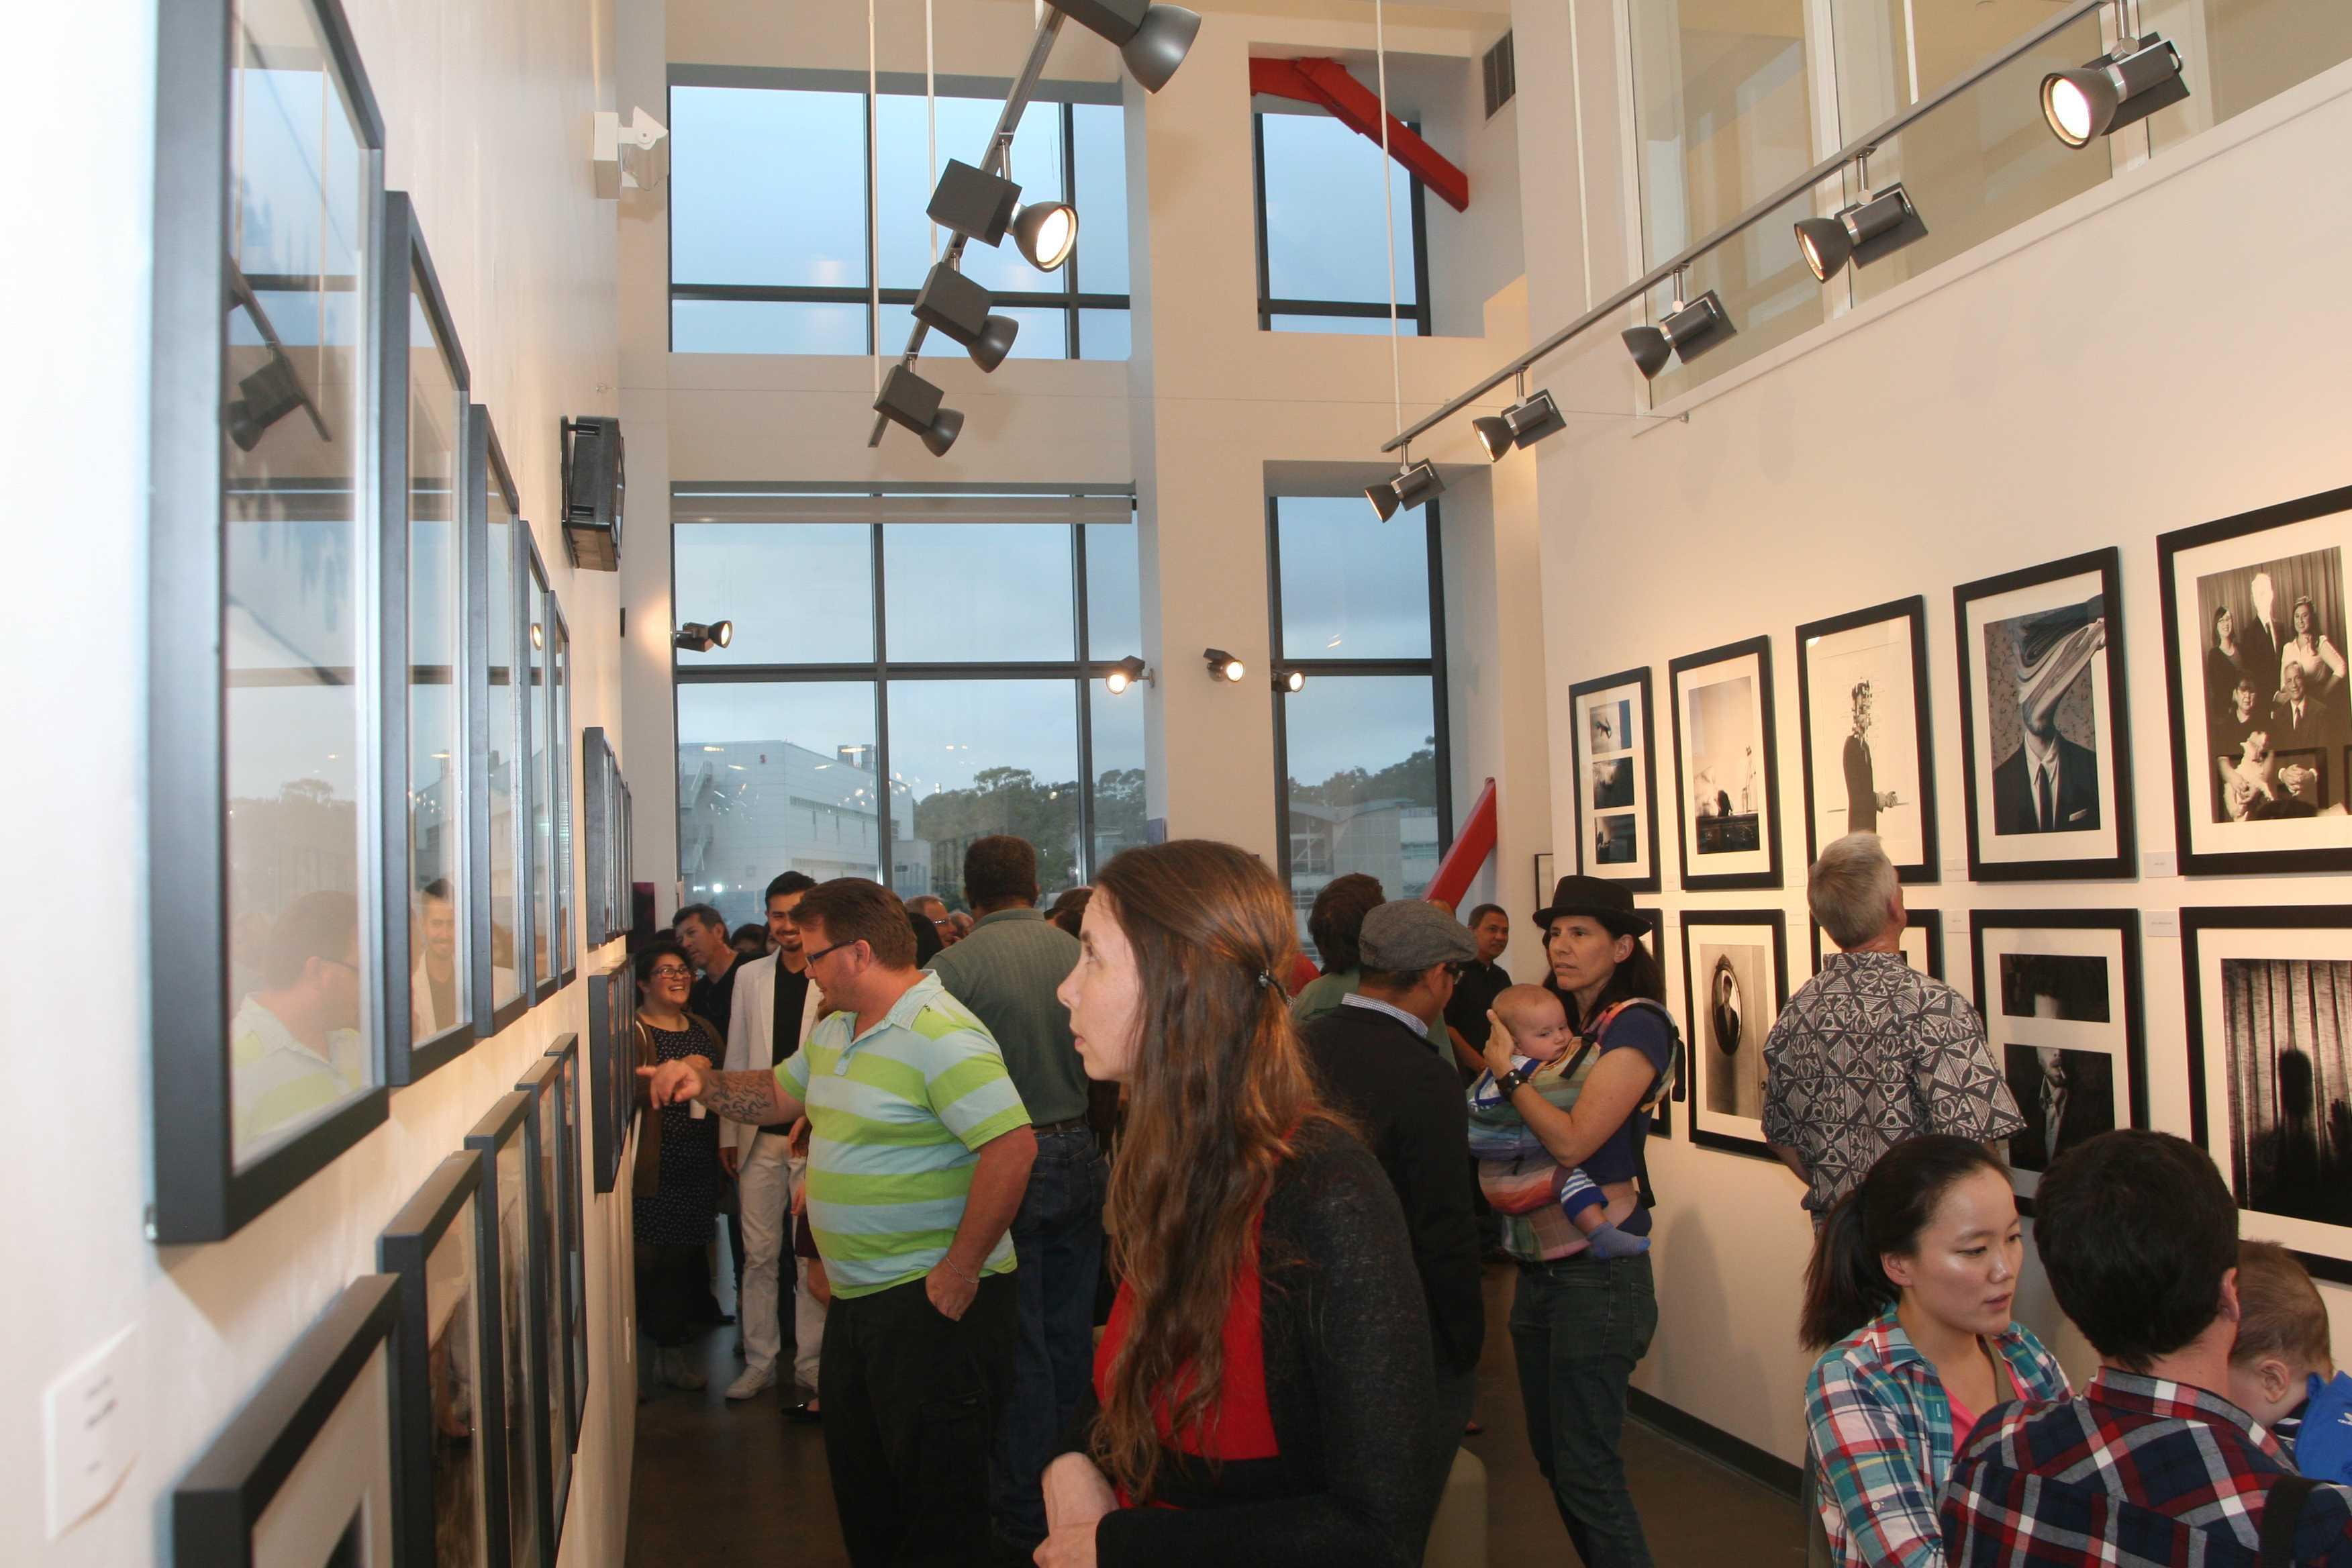 Guests enjoyed the portfolios of City students, including Edward Honaker's works titled